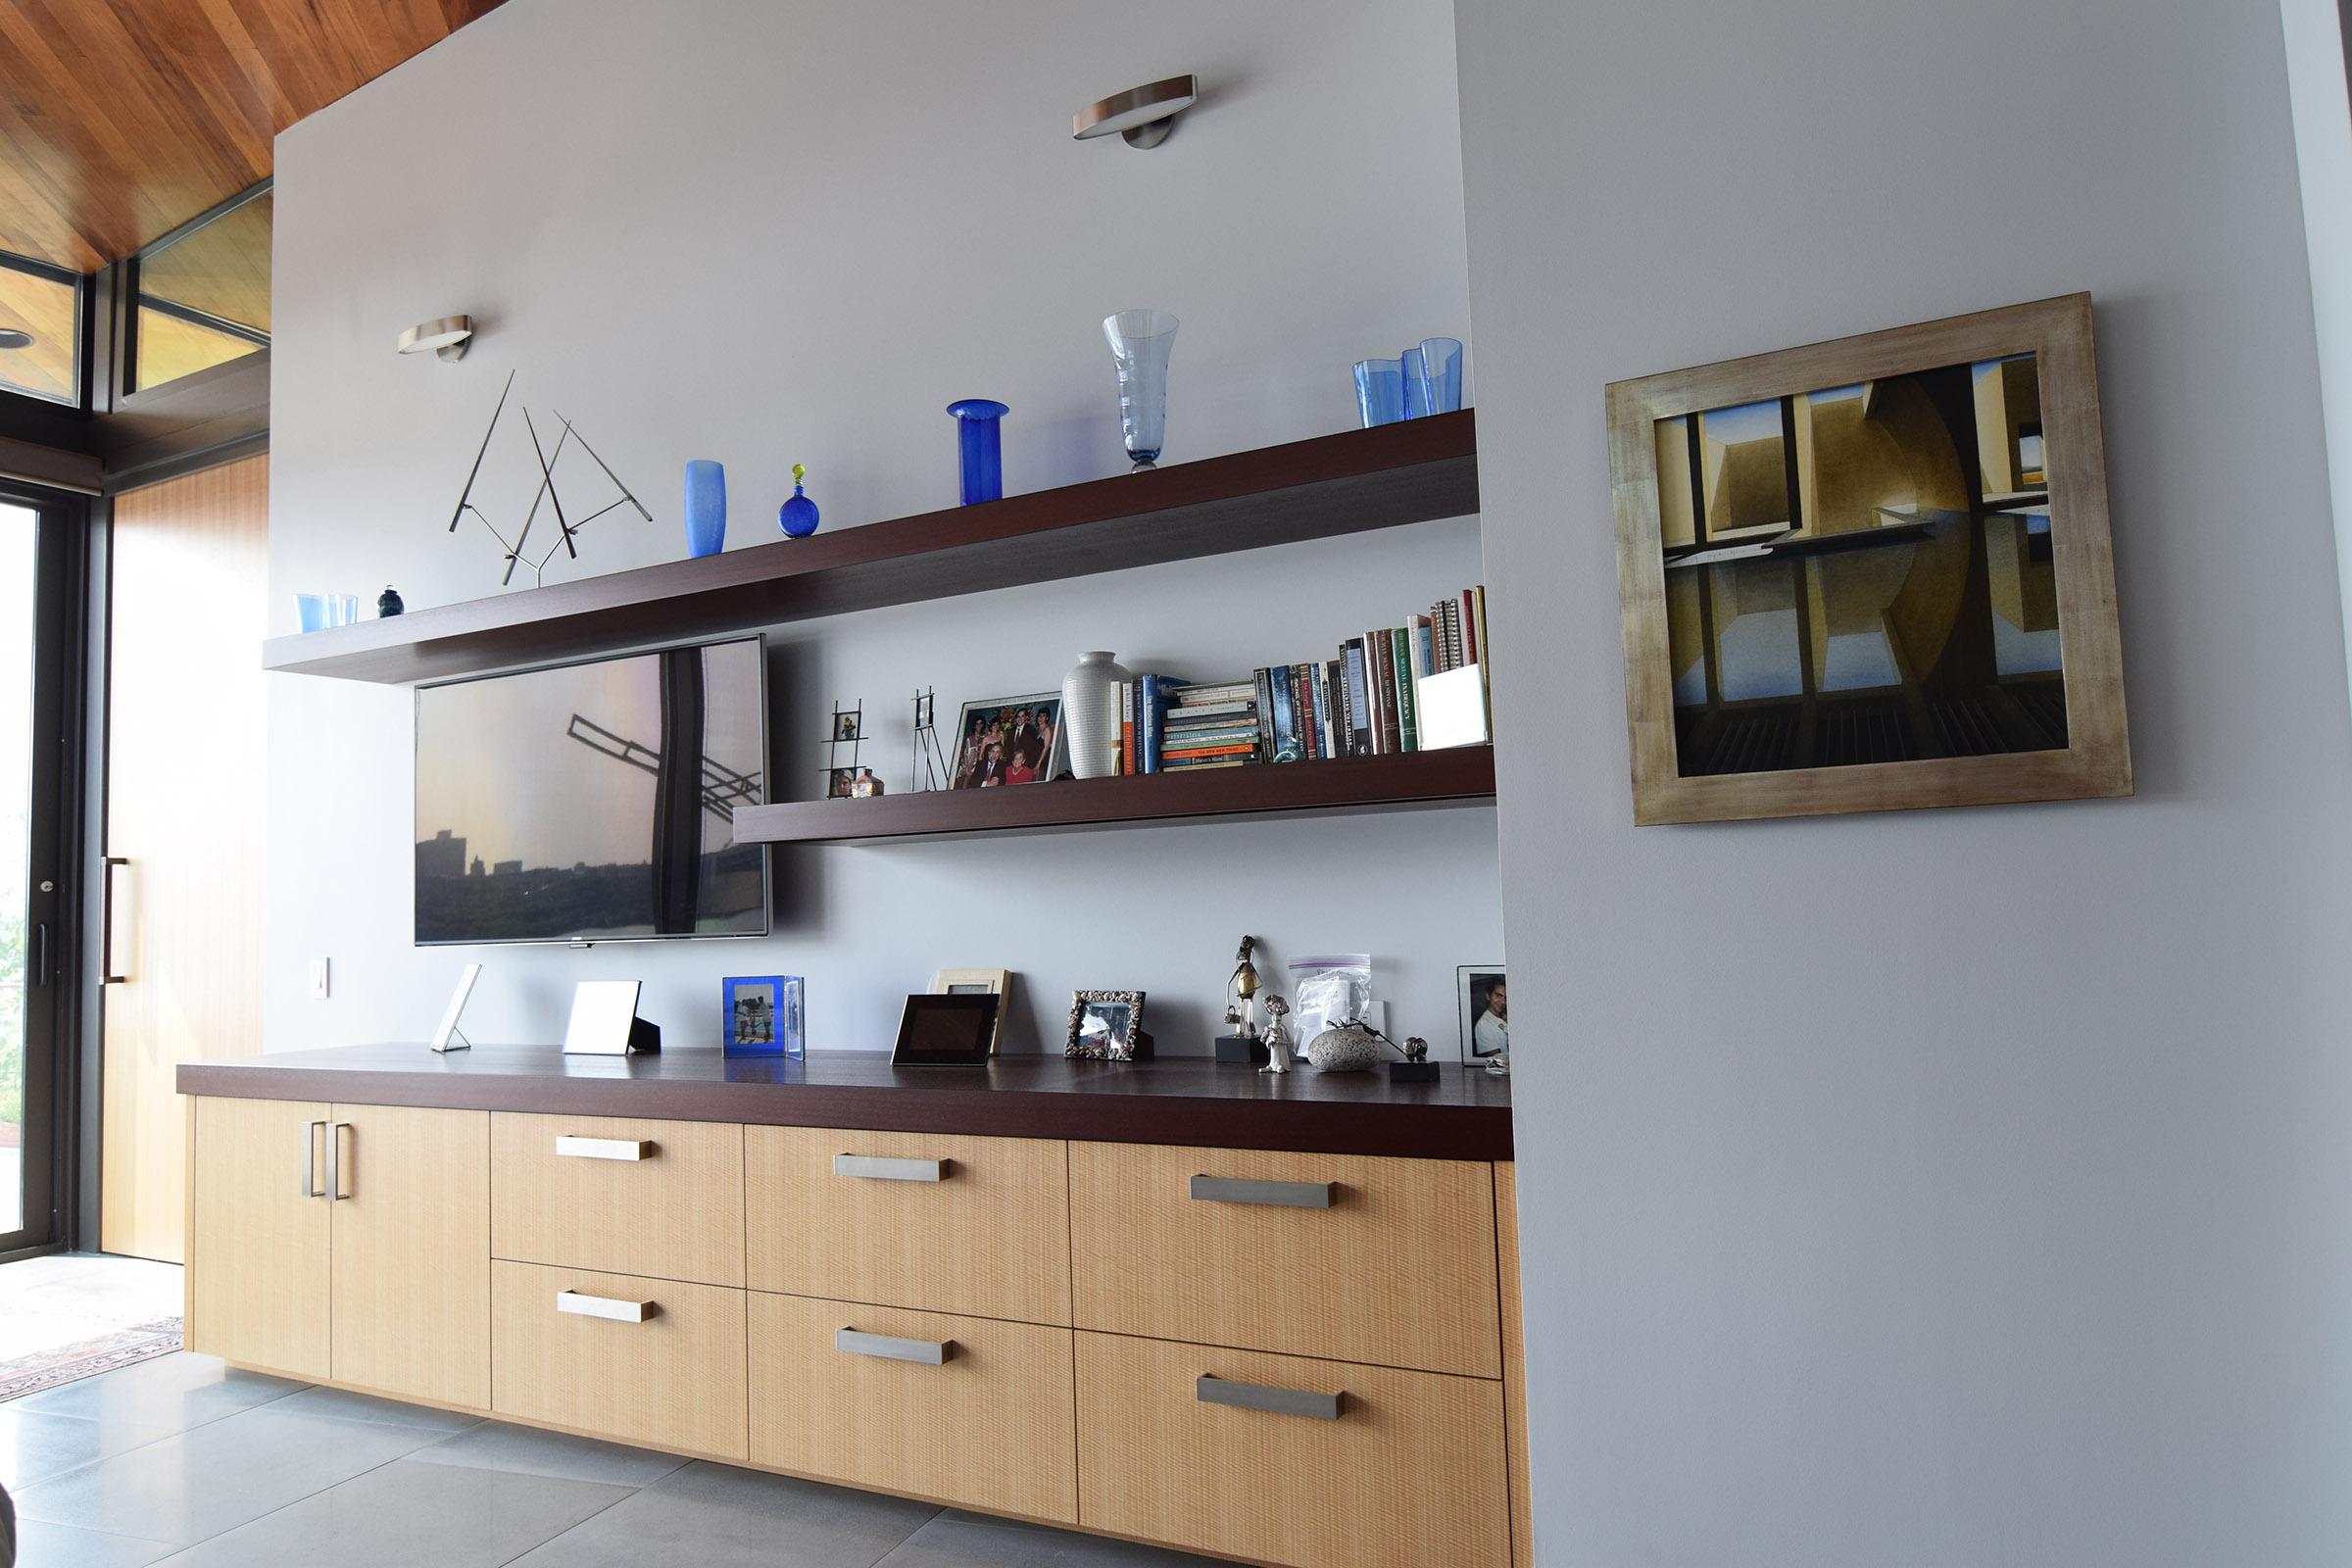 Master Bedroom Custom Rift Anigre Drawers with Mahogany Counter & Shelves; Rift Anigre Pocket Door